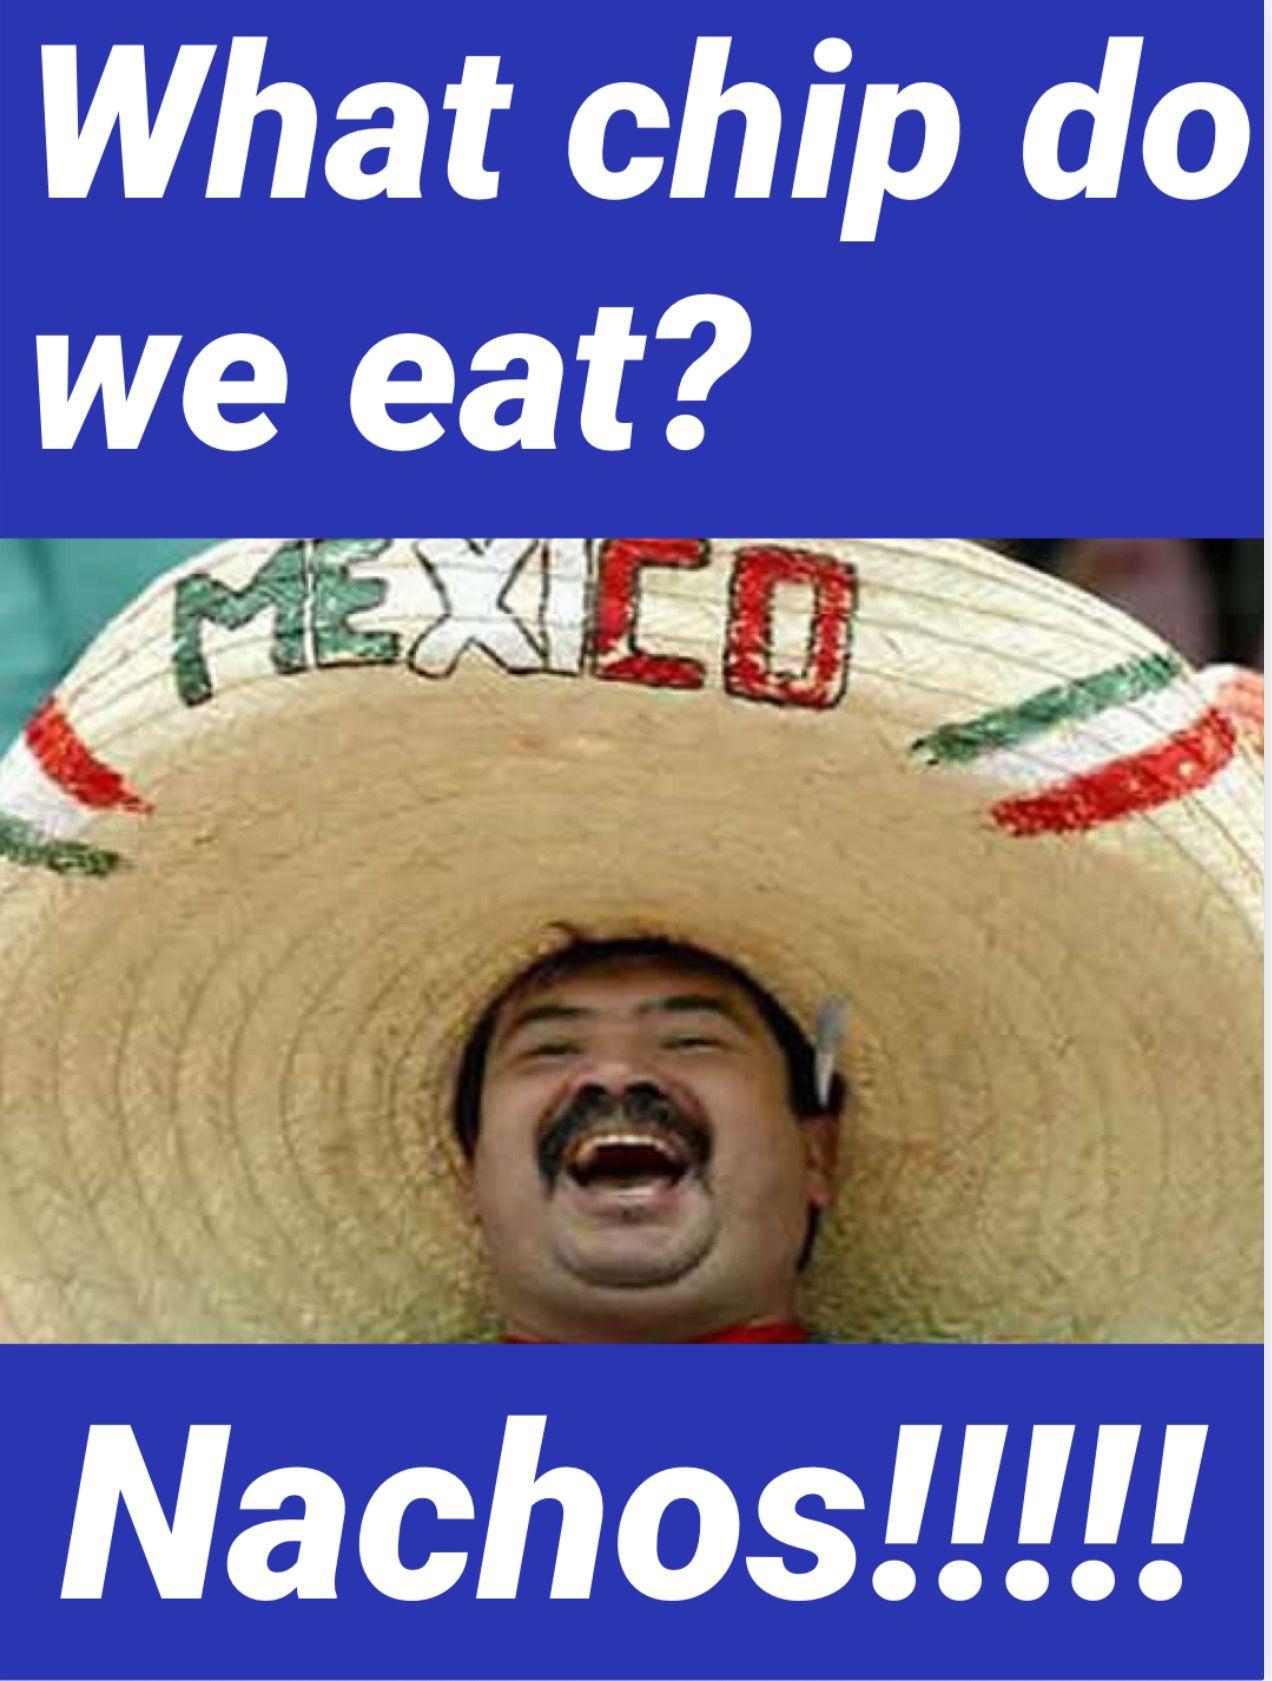 Pin By Anthonyortizwwefan7425602 On Mexican Jokes Mexican Jokes Mexican Words Mexican Memes